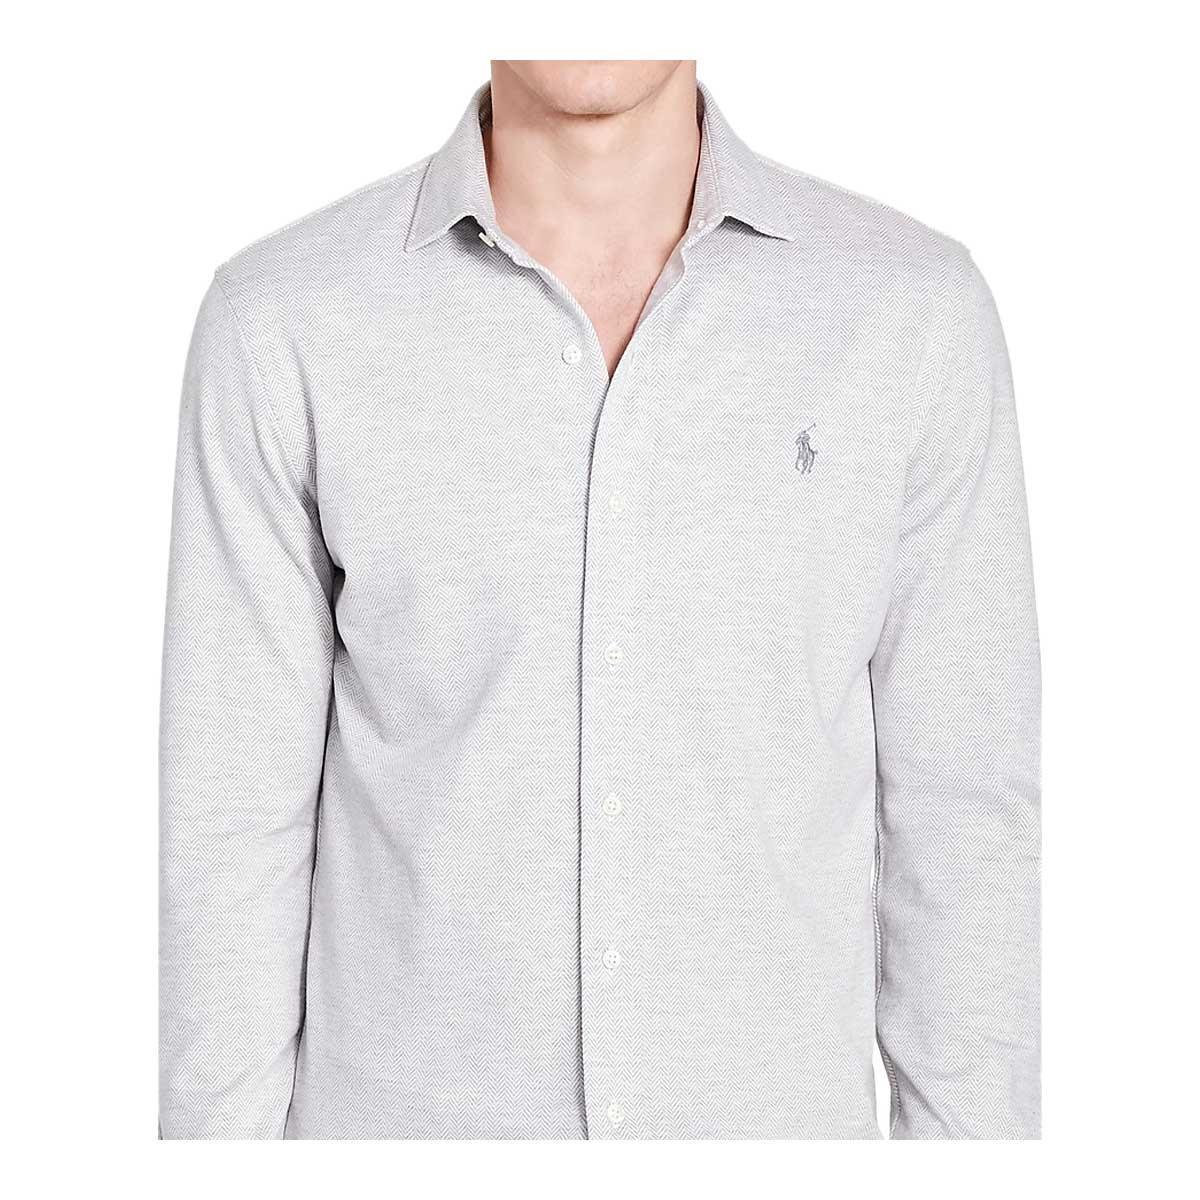 Lyst Polo Ralph Lauren Herringbone Knit Dress Shirt In Gray For Men